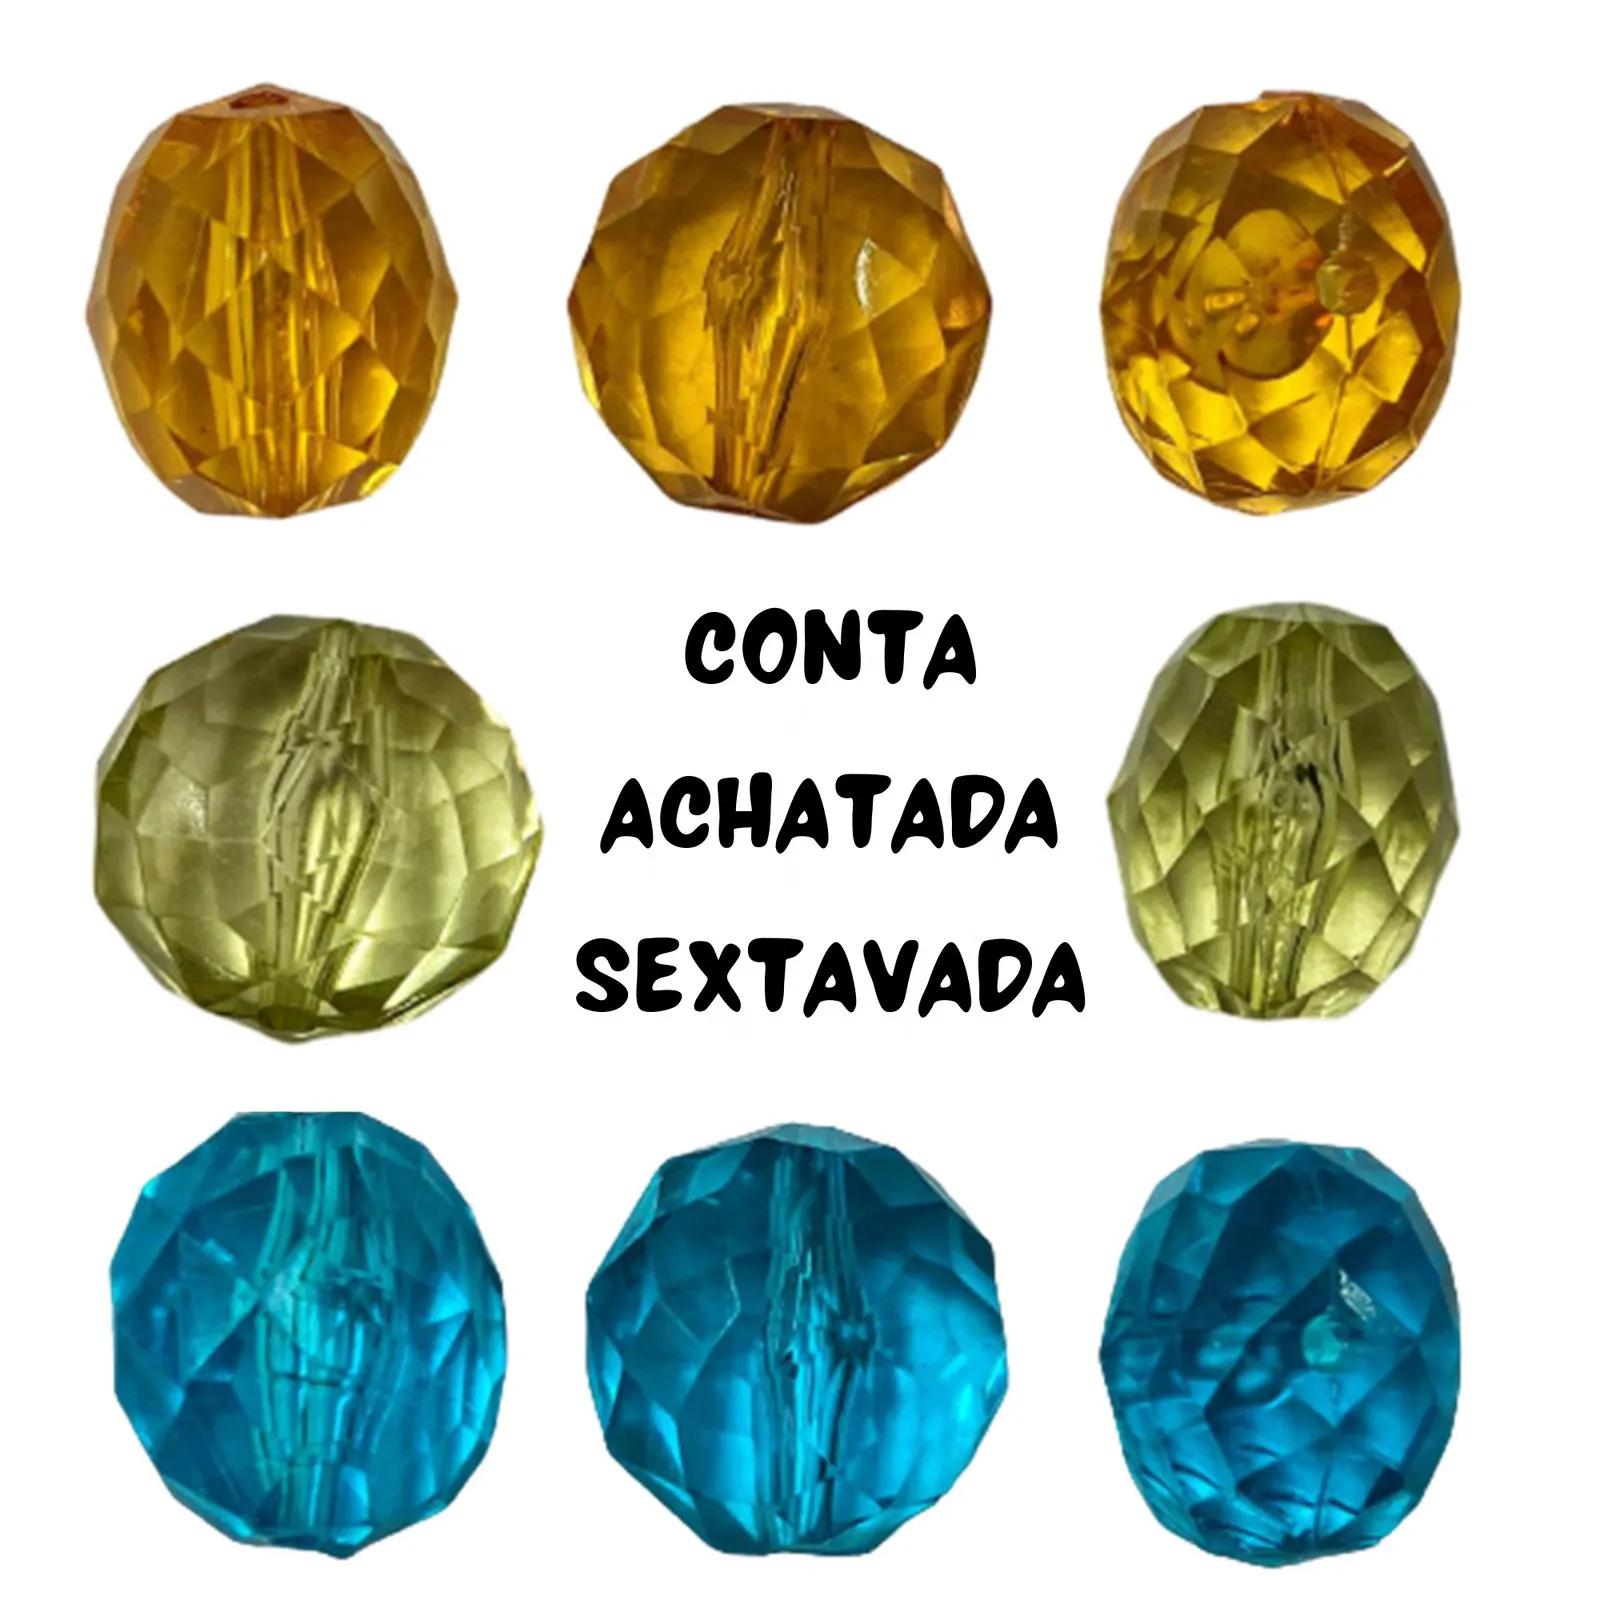 Conta Achatada Sextavada 13x11mm - 250g